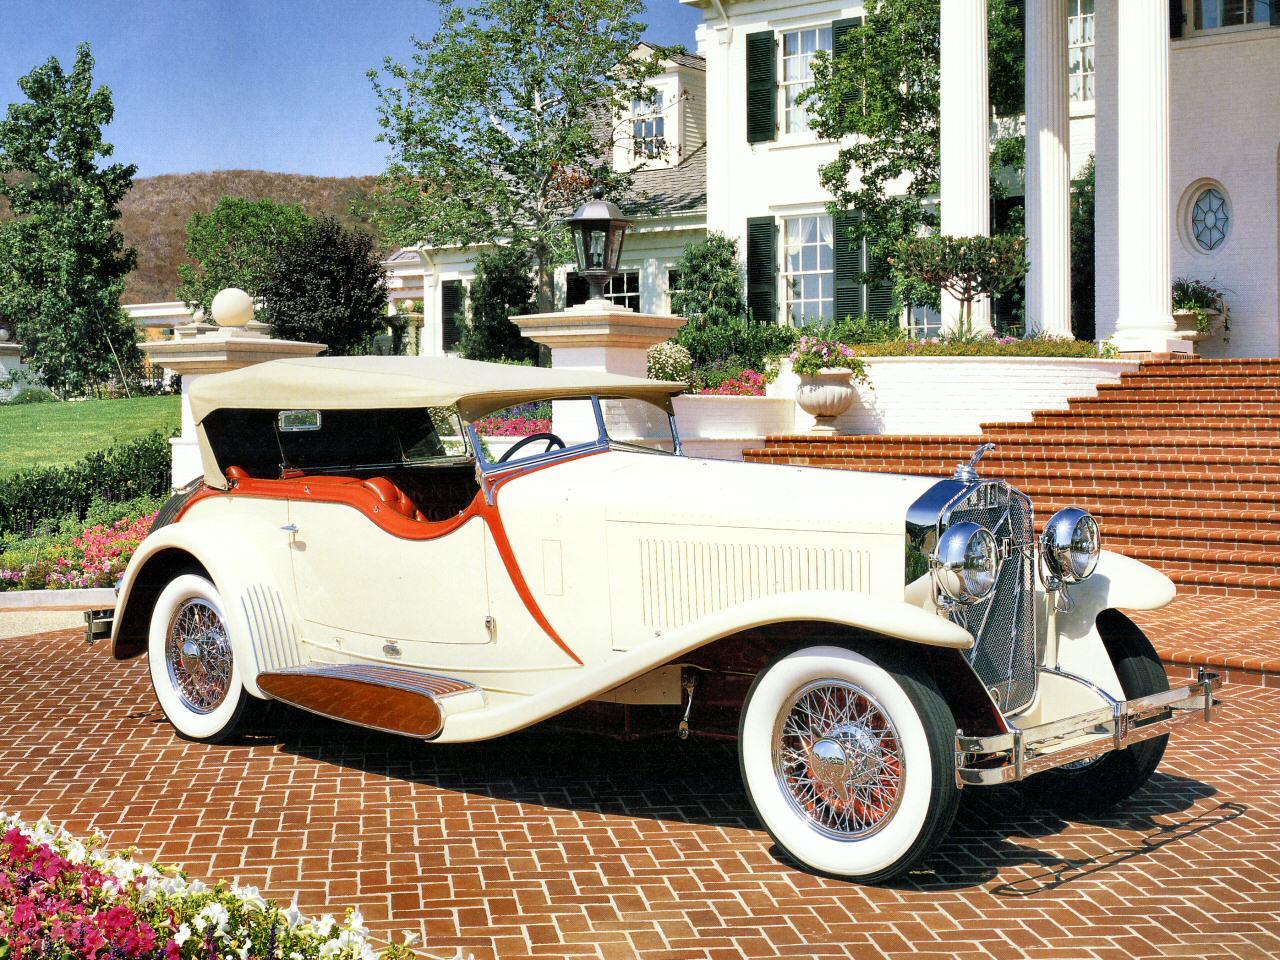 1933 Isotta Fraschini Dual Cowl Phaeton Body By Castagna Of Milan Cream Fvr